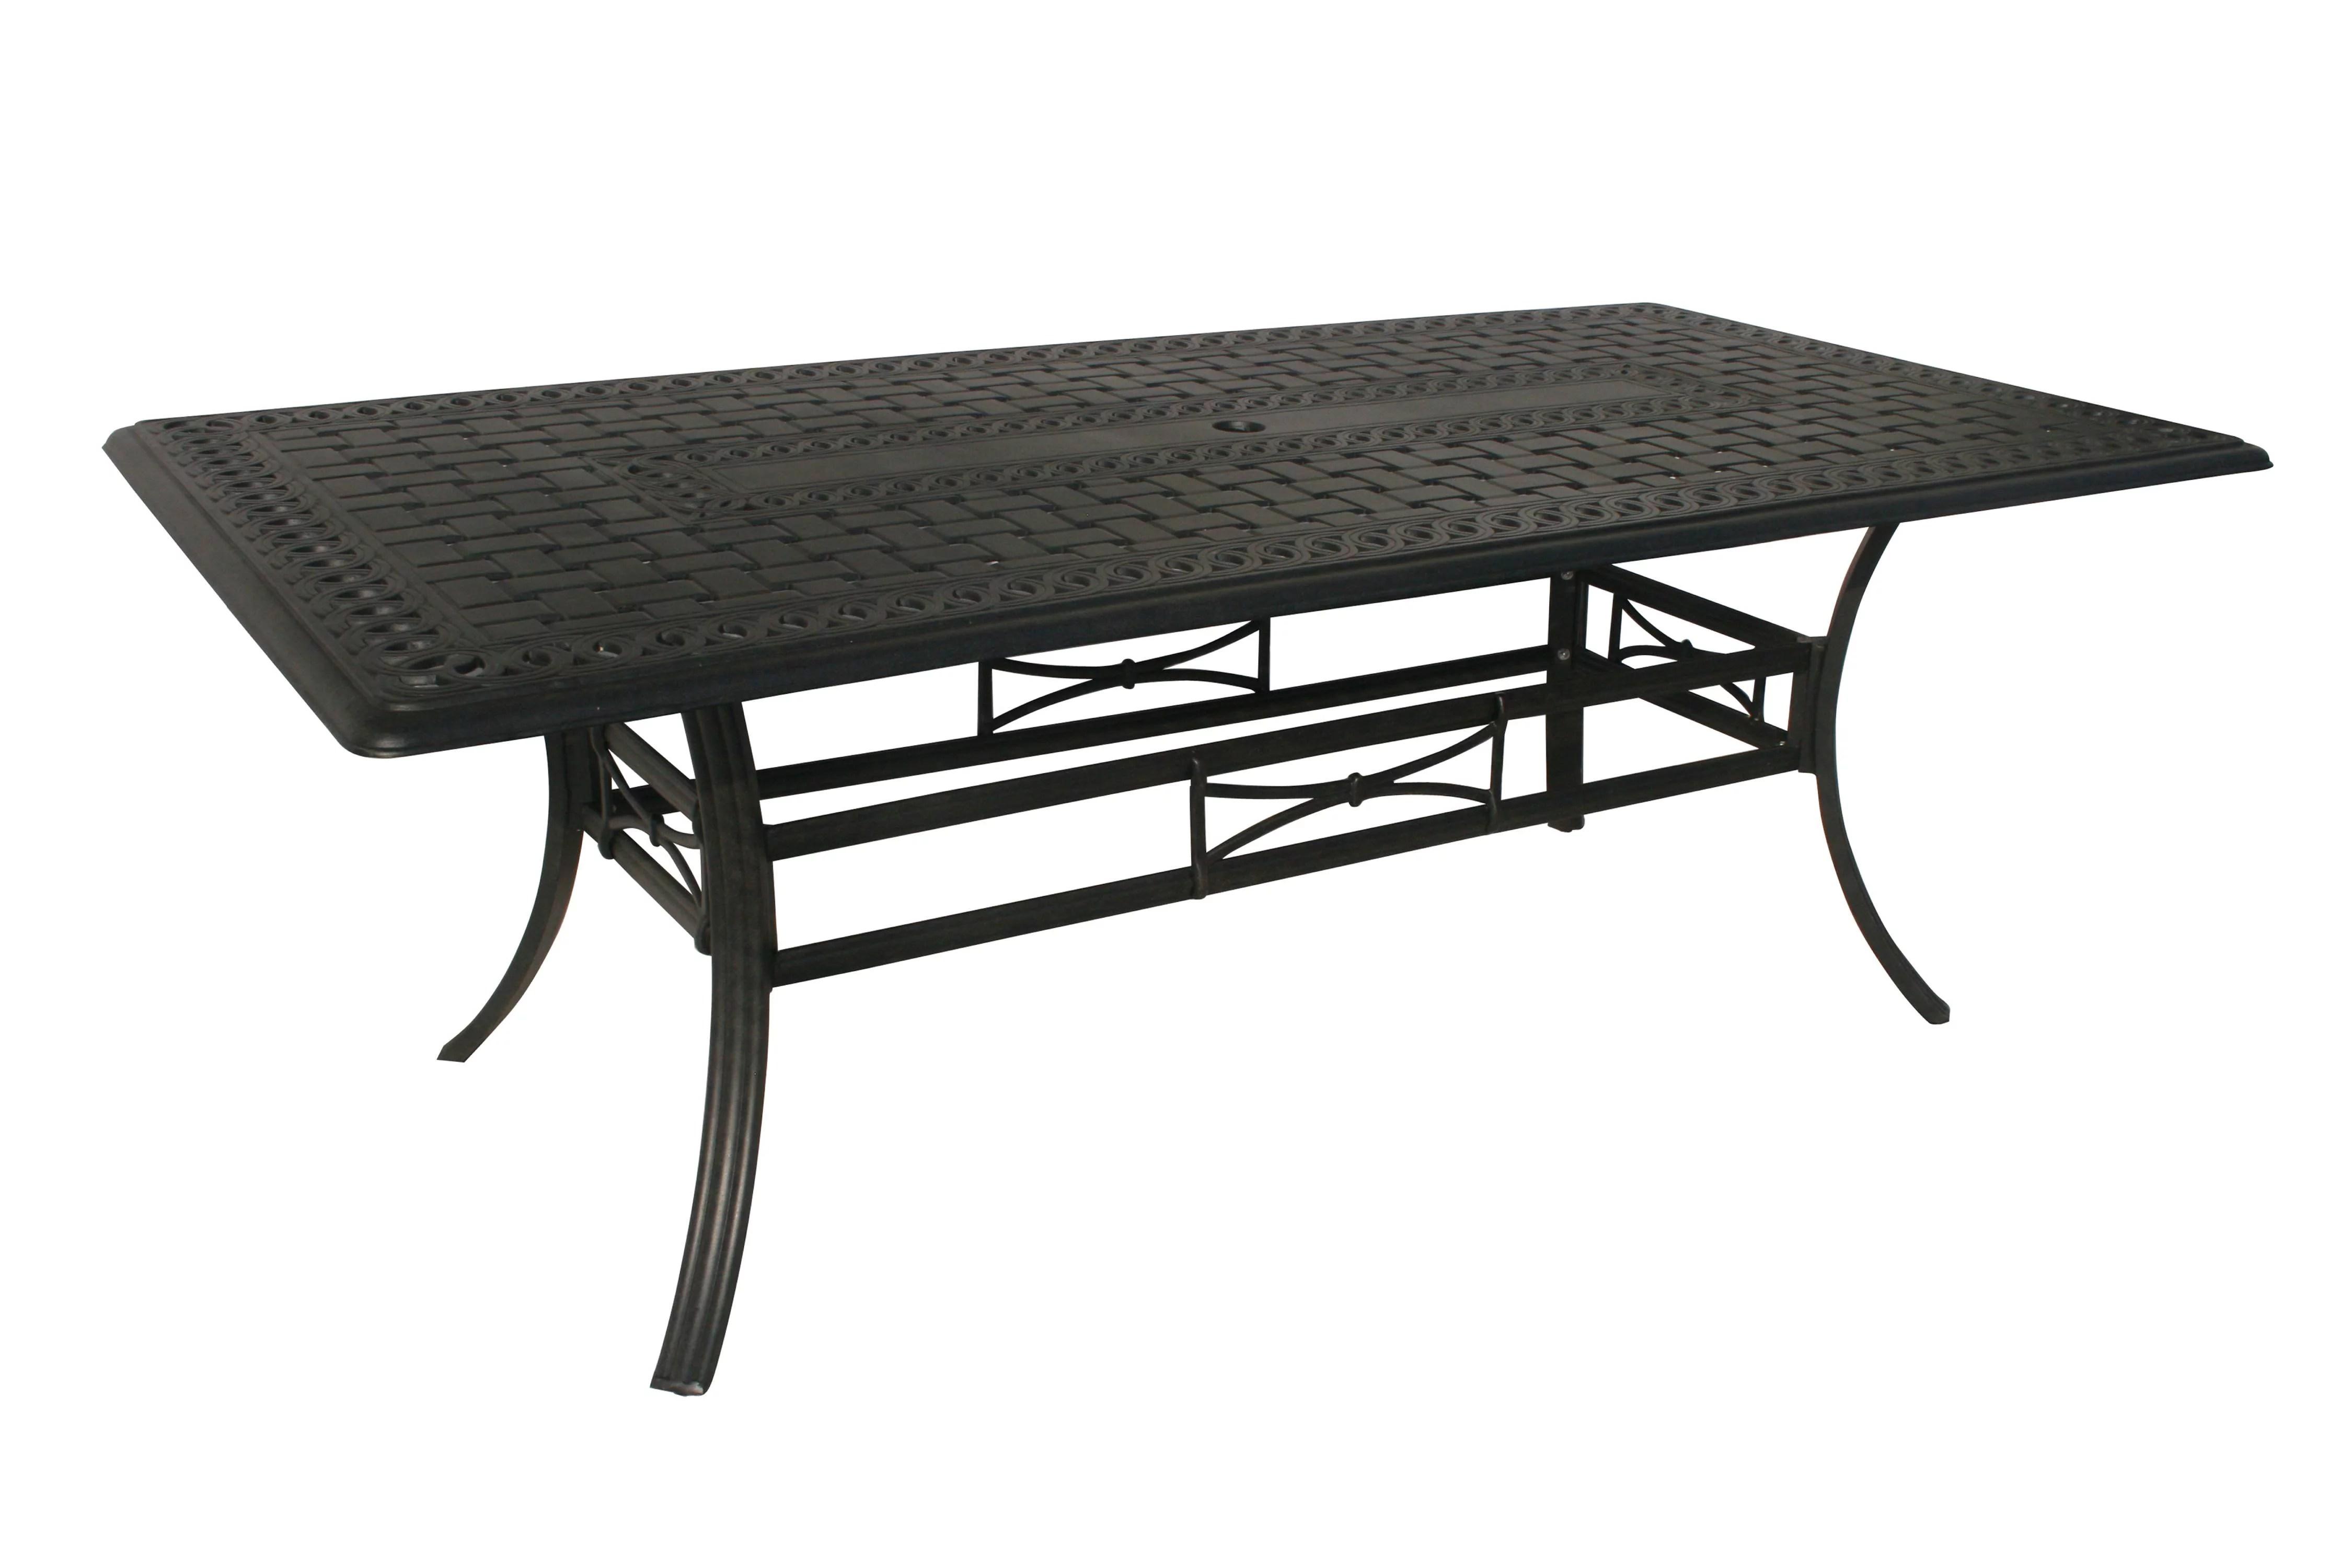 84 jet black rectangular aluminum outdoor patio dining table w umbrella hole